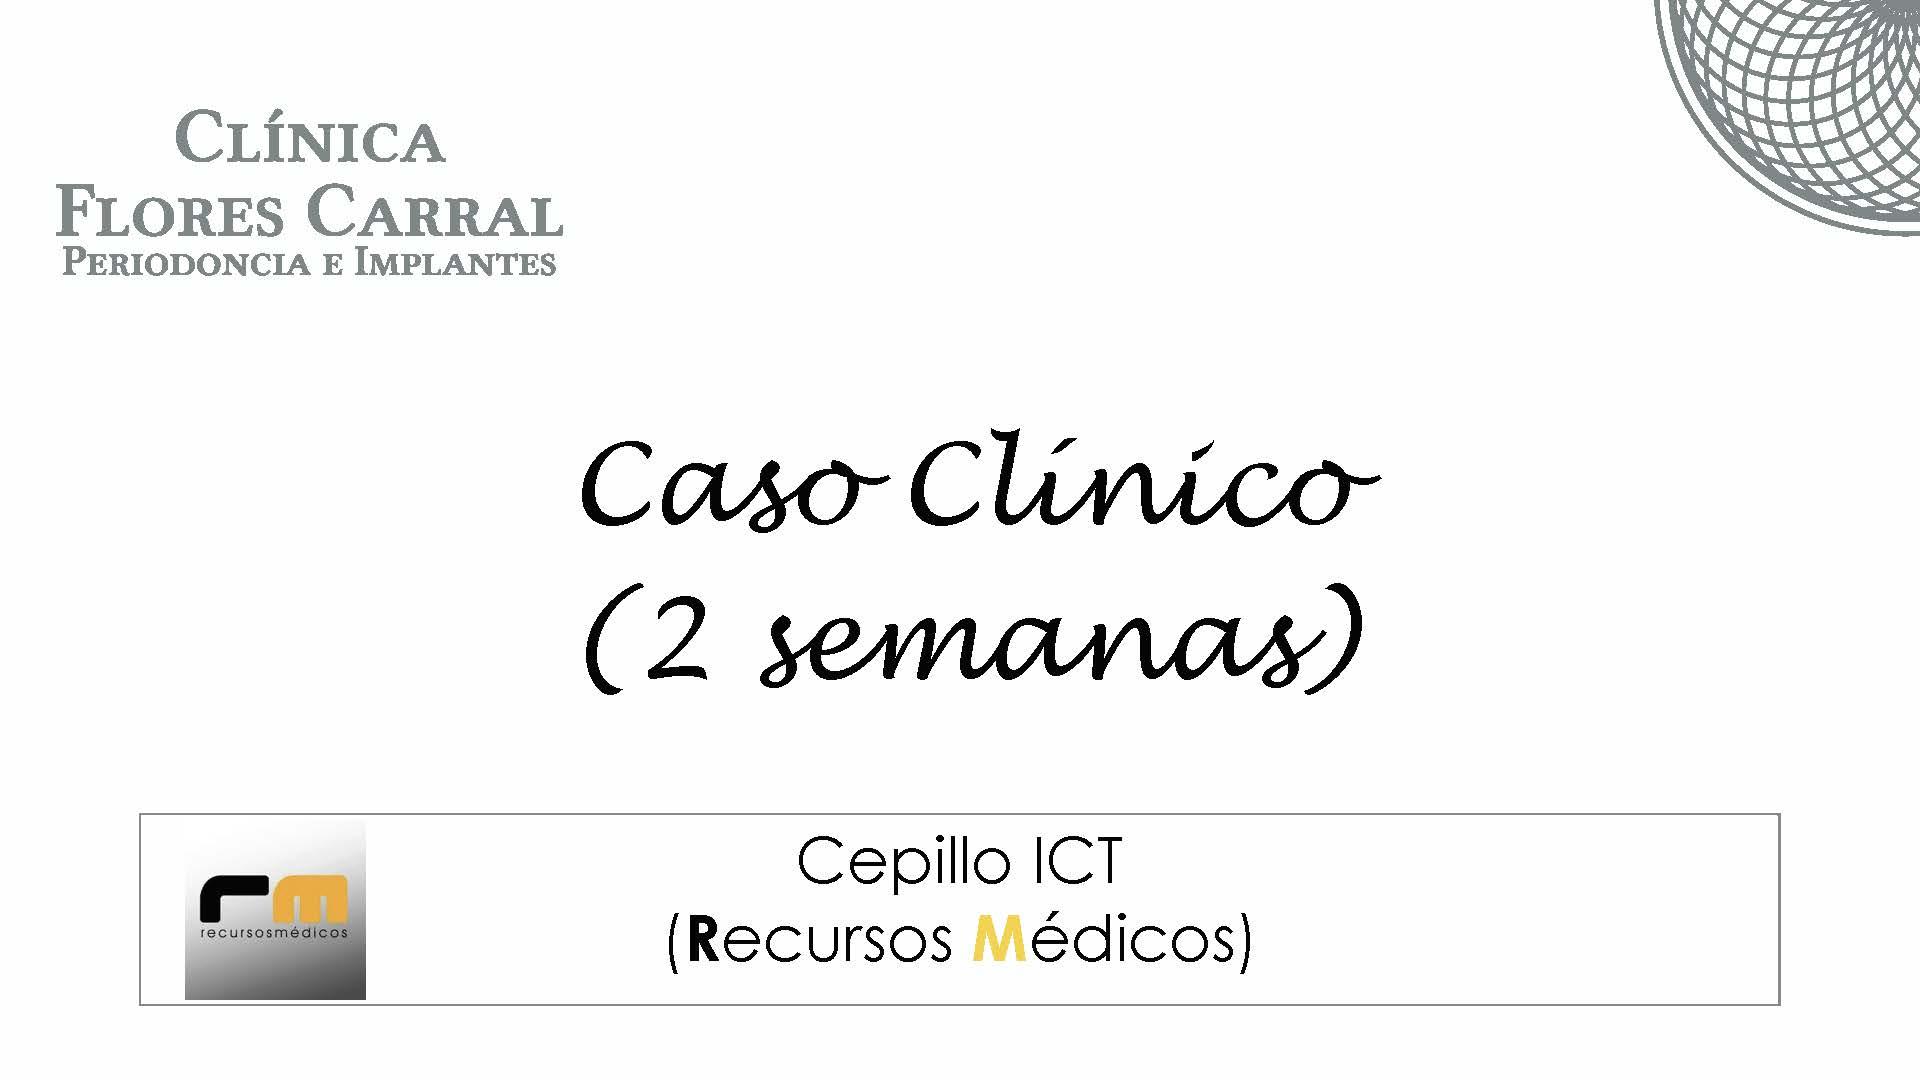 Dra Cristina Carral periimplantitis son ICT